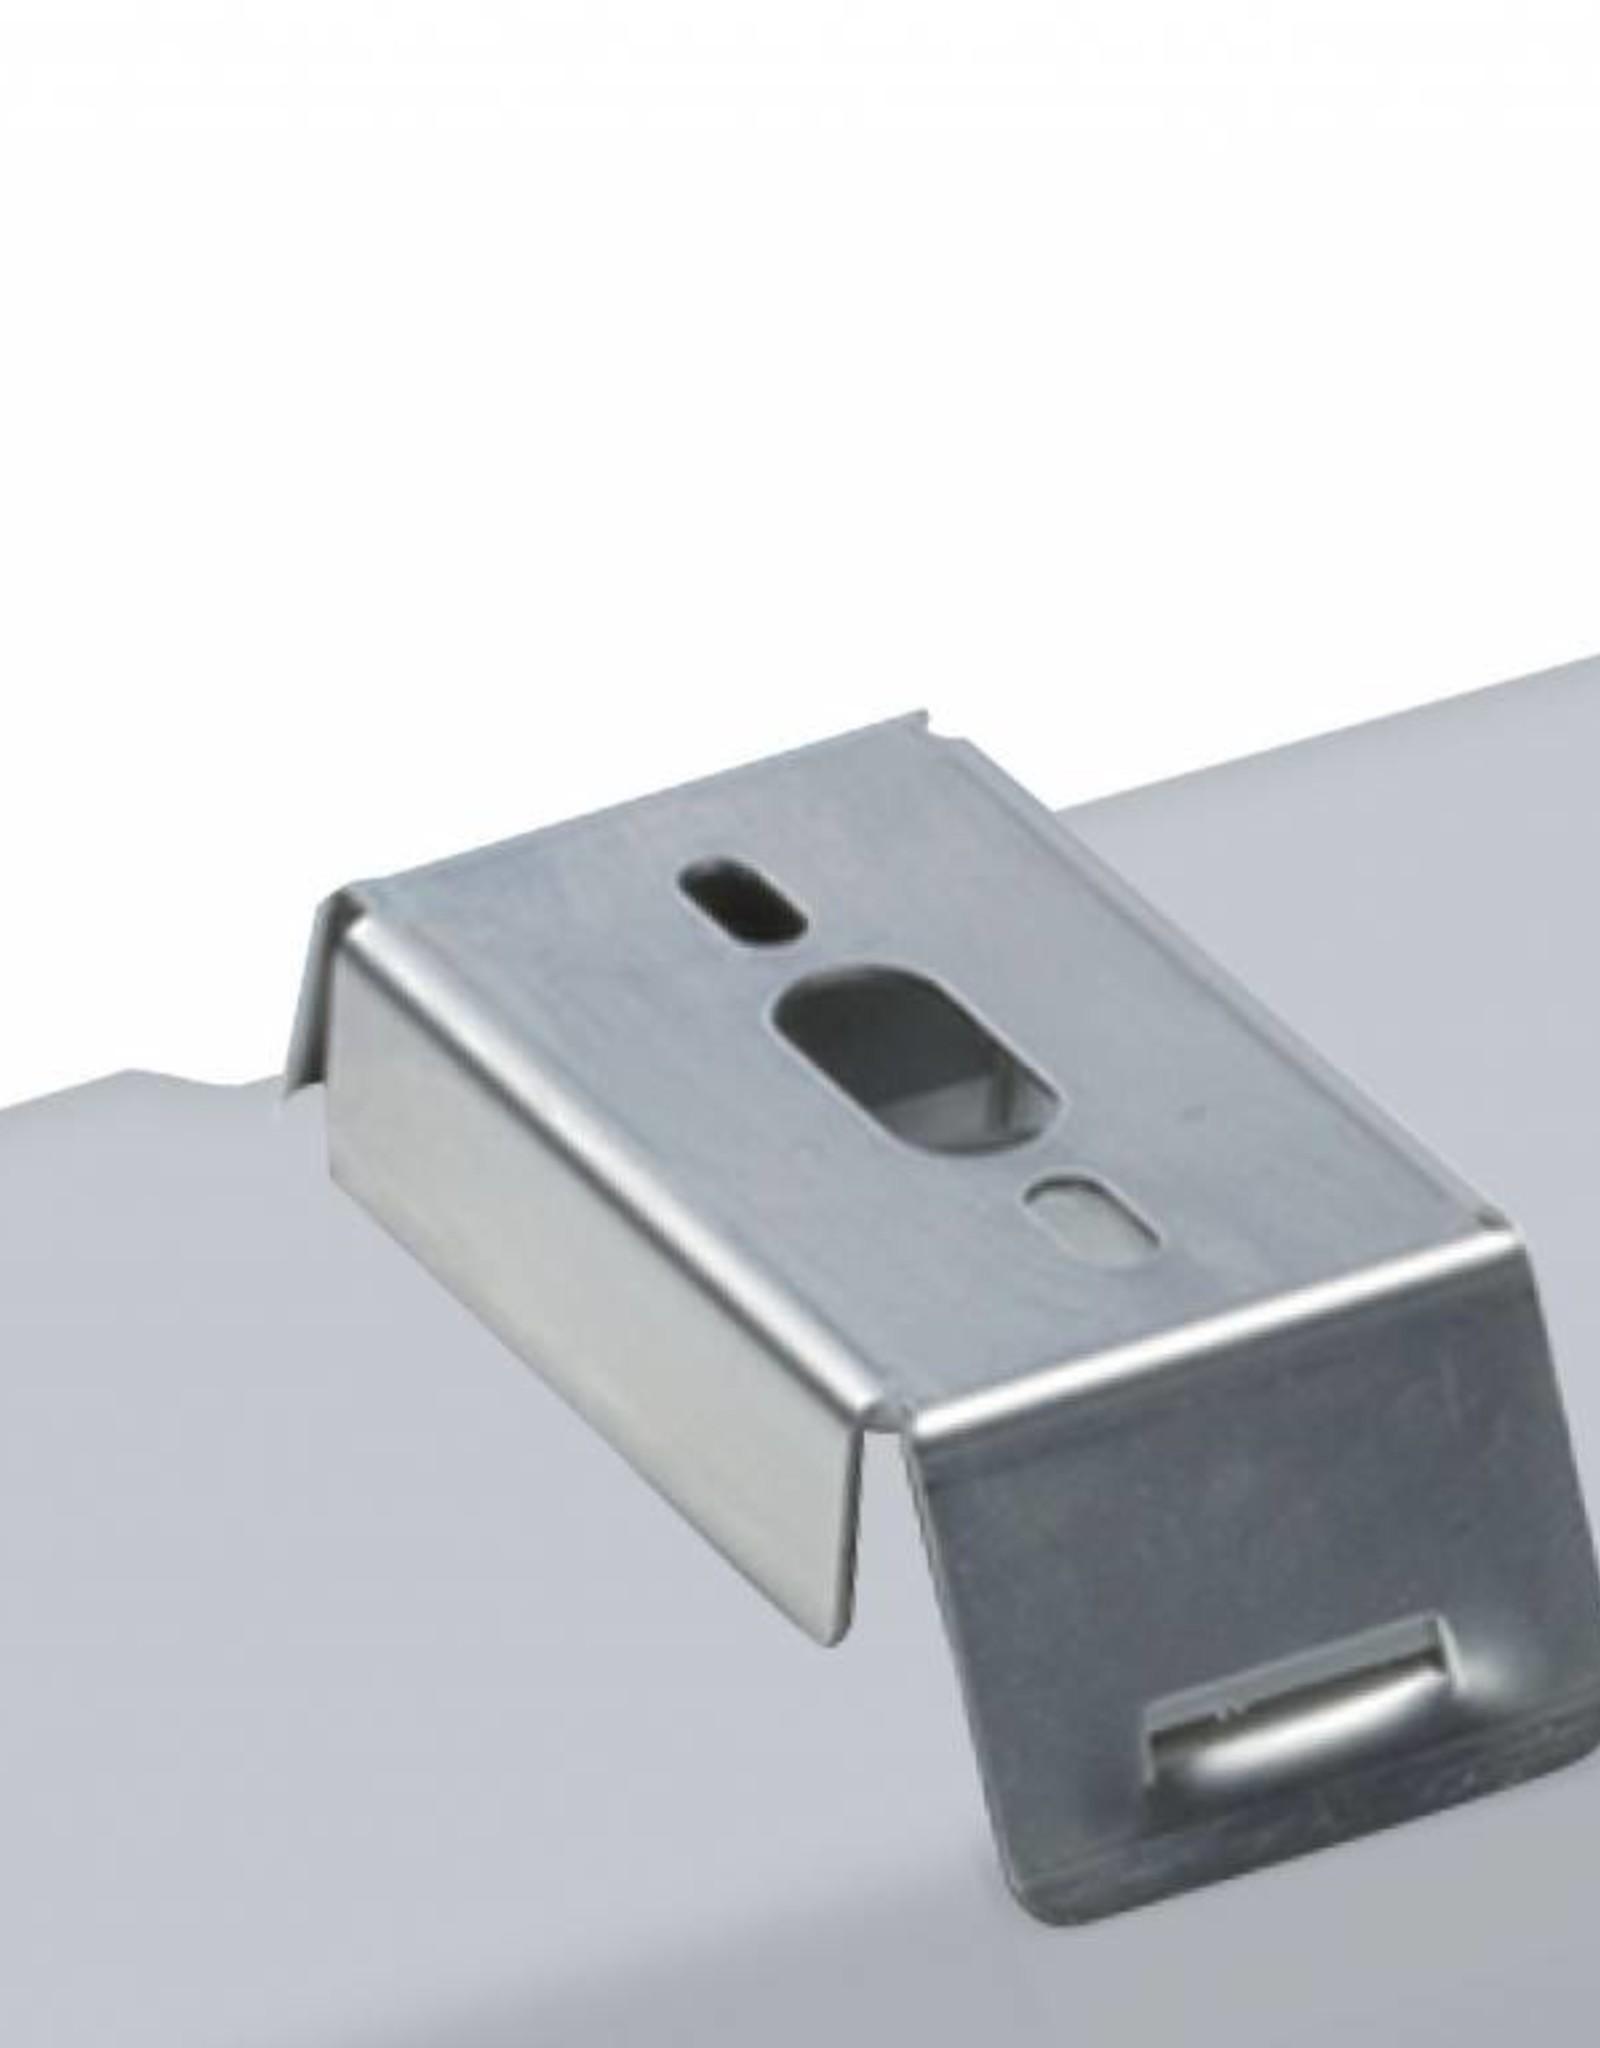 Prima 1x14W HE - ABS - inox clips - HF ballast